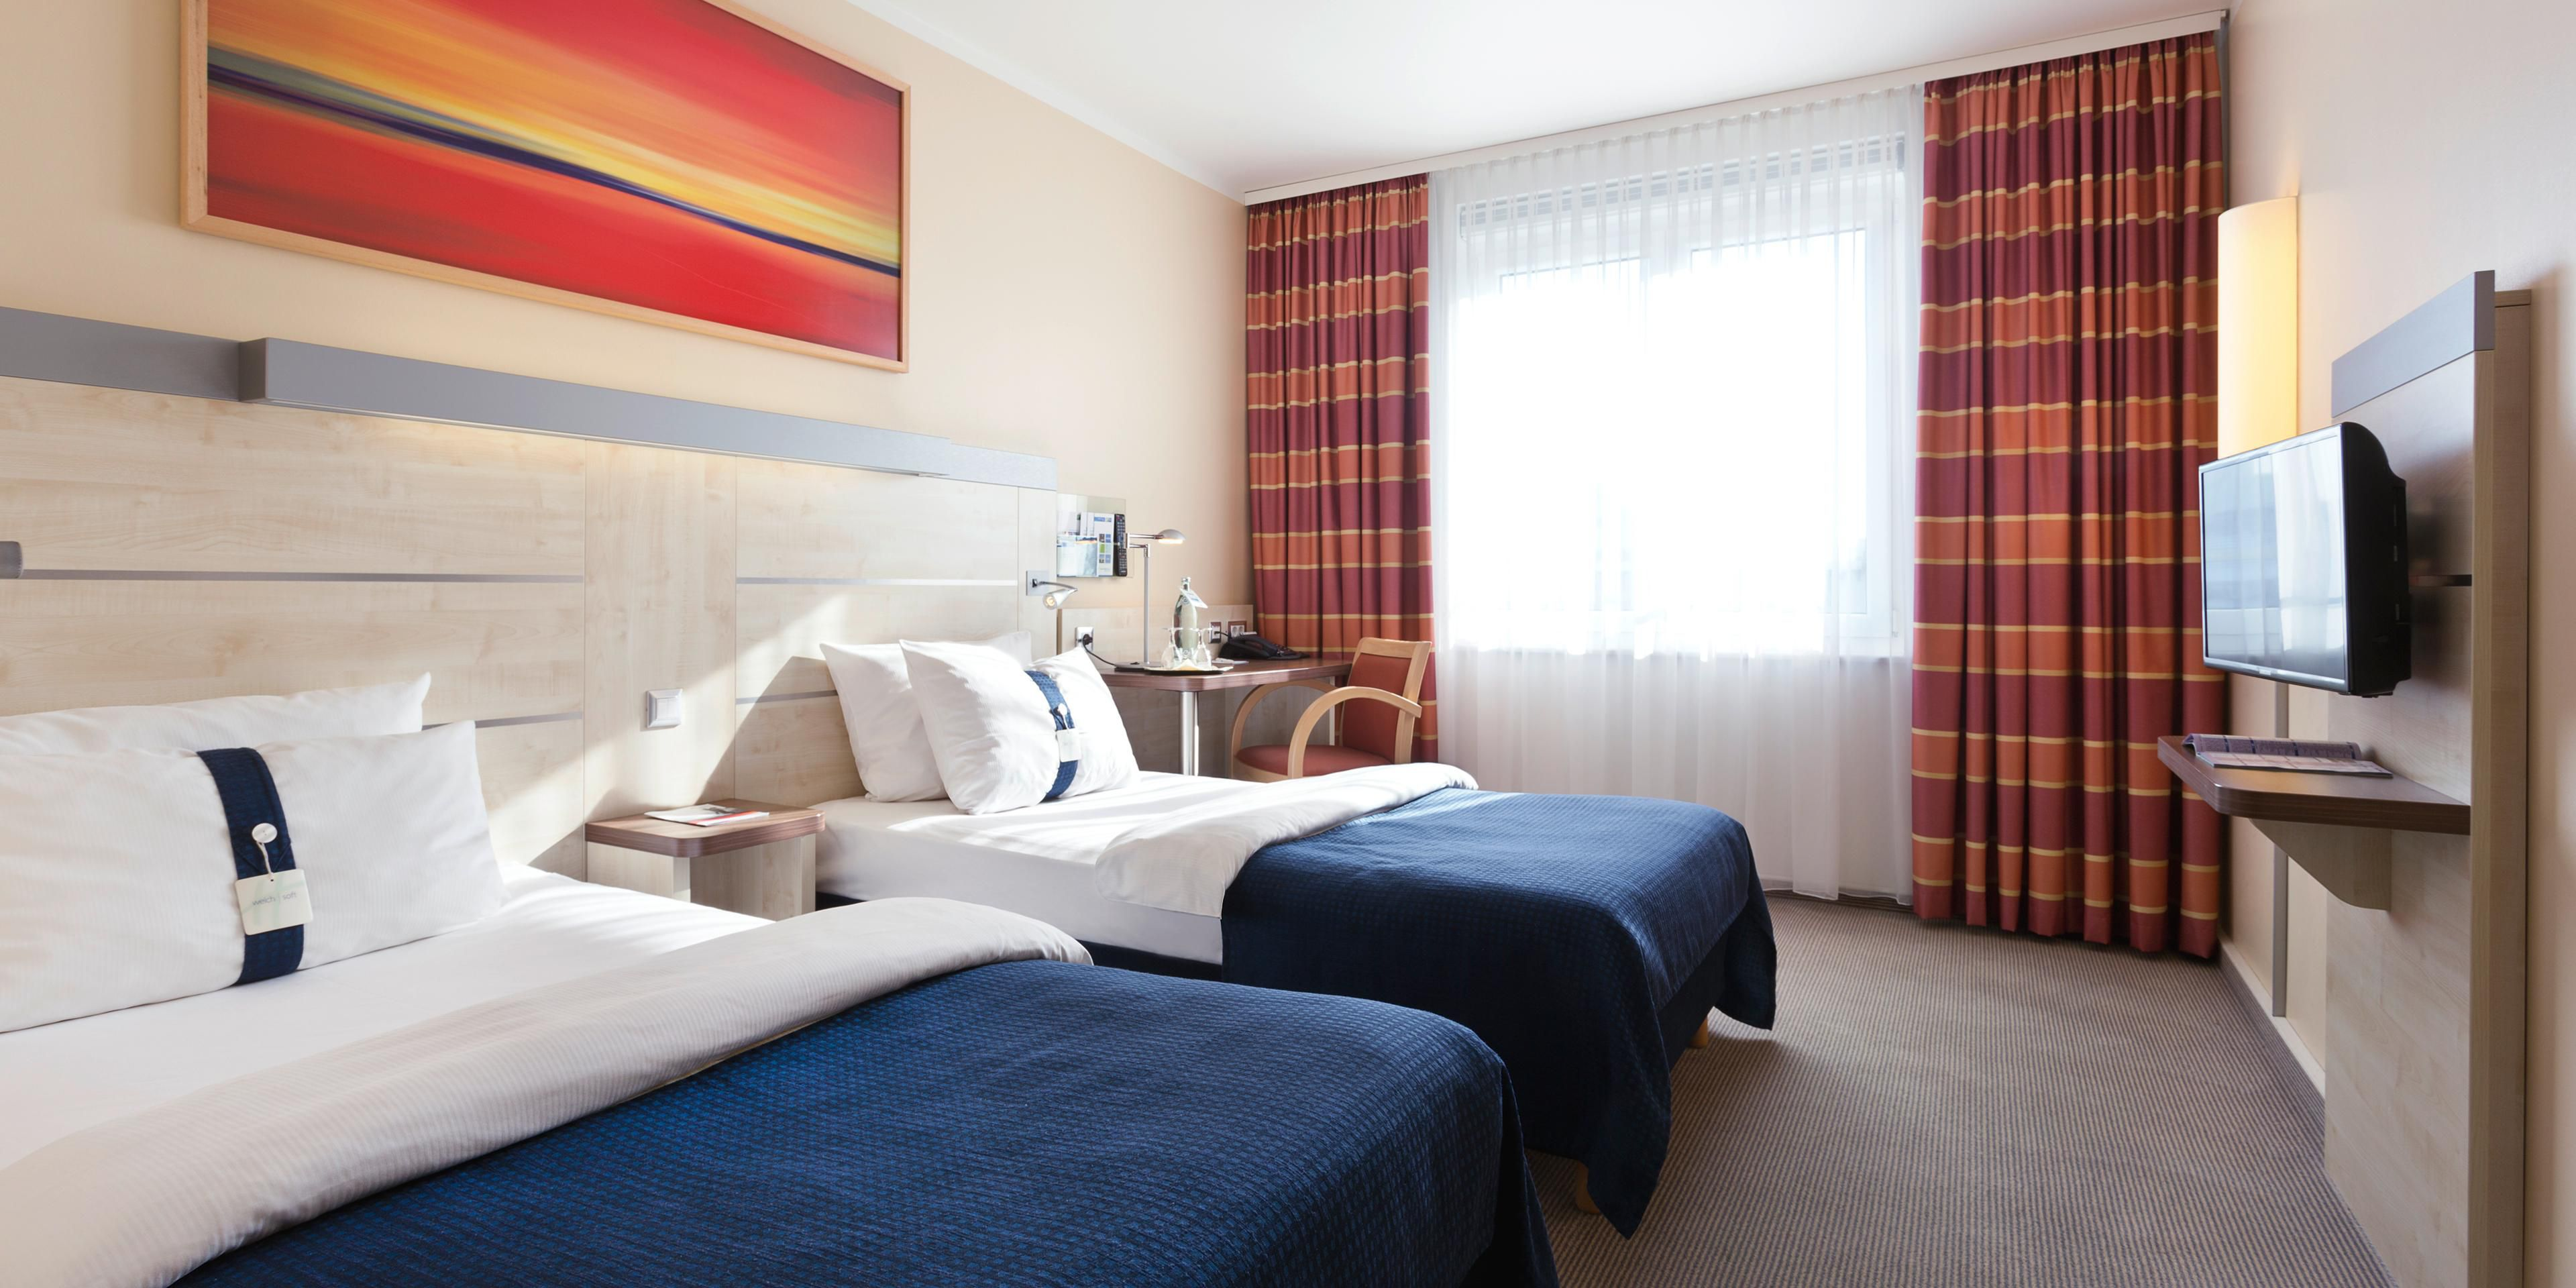 Holiday Inn Express Singen Hotel by IHG